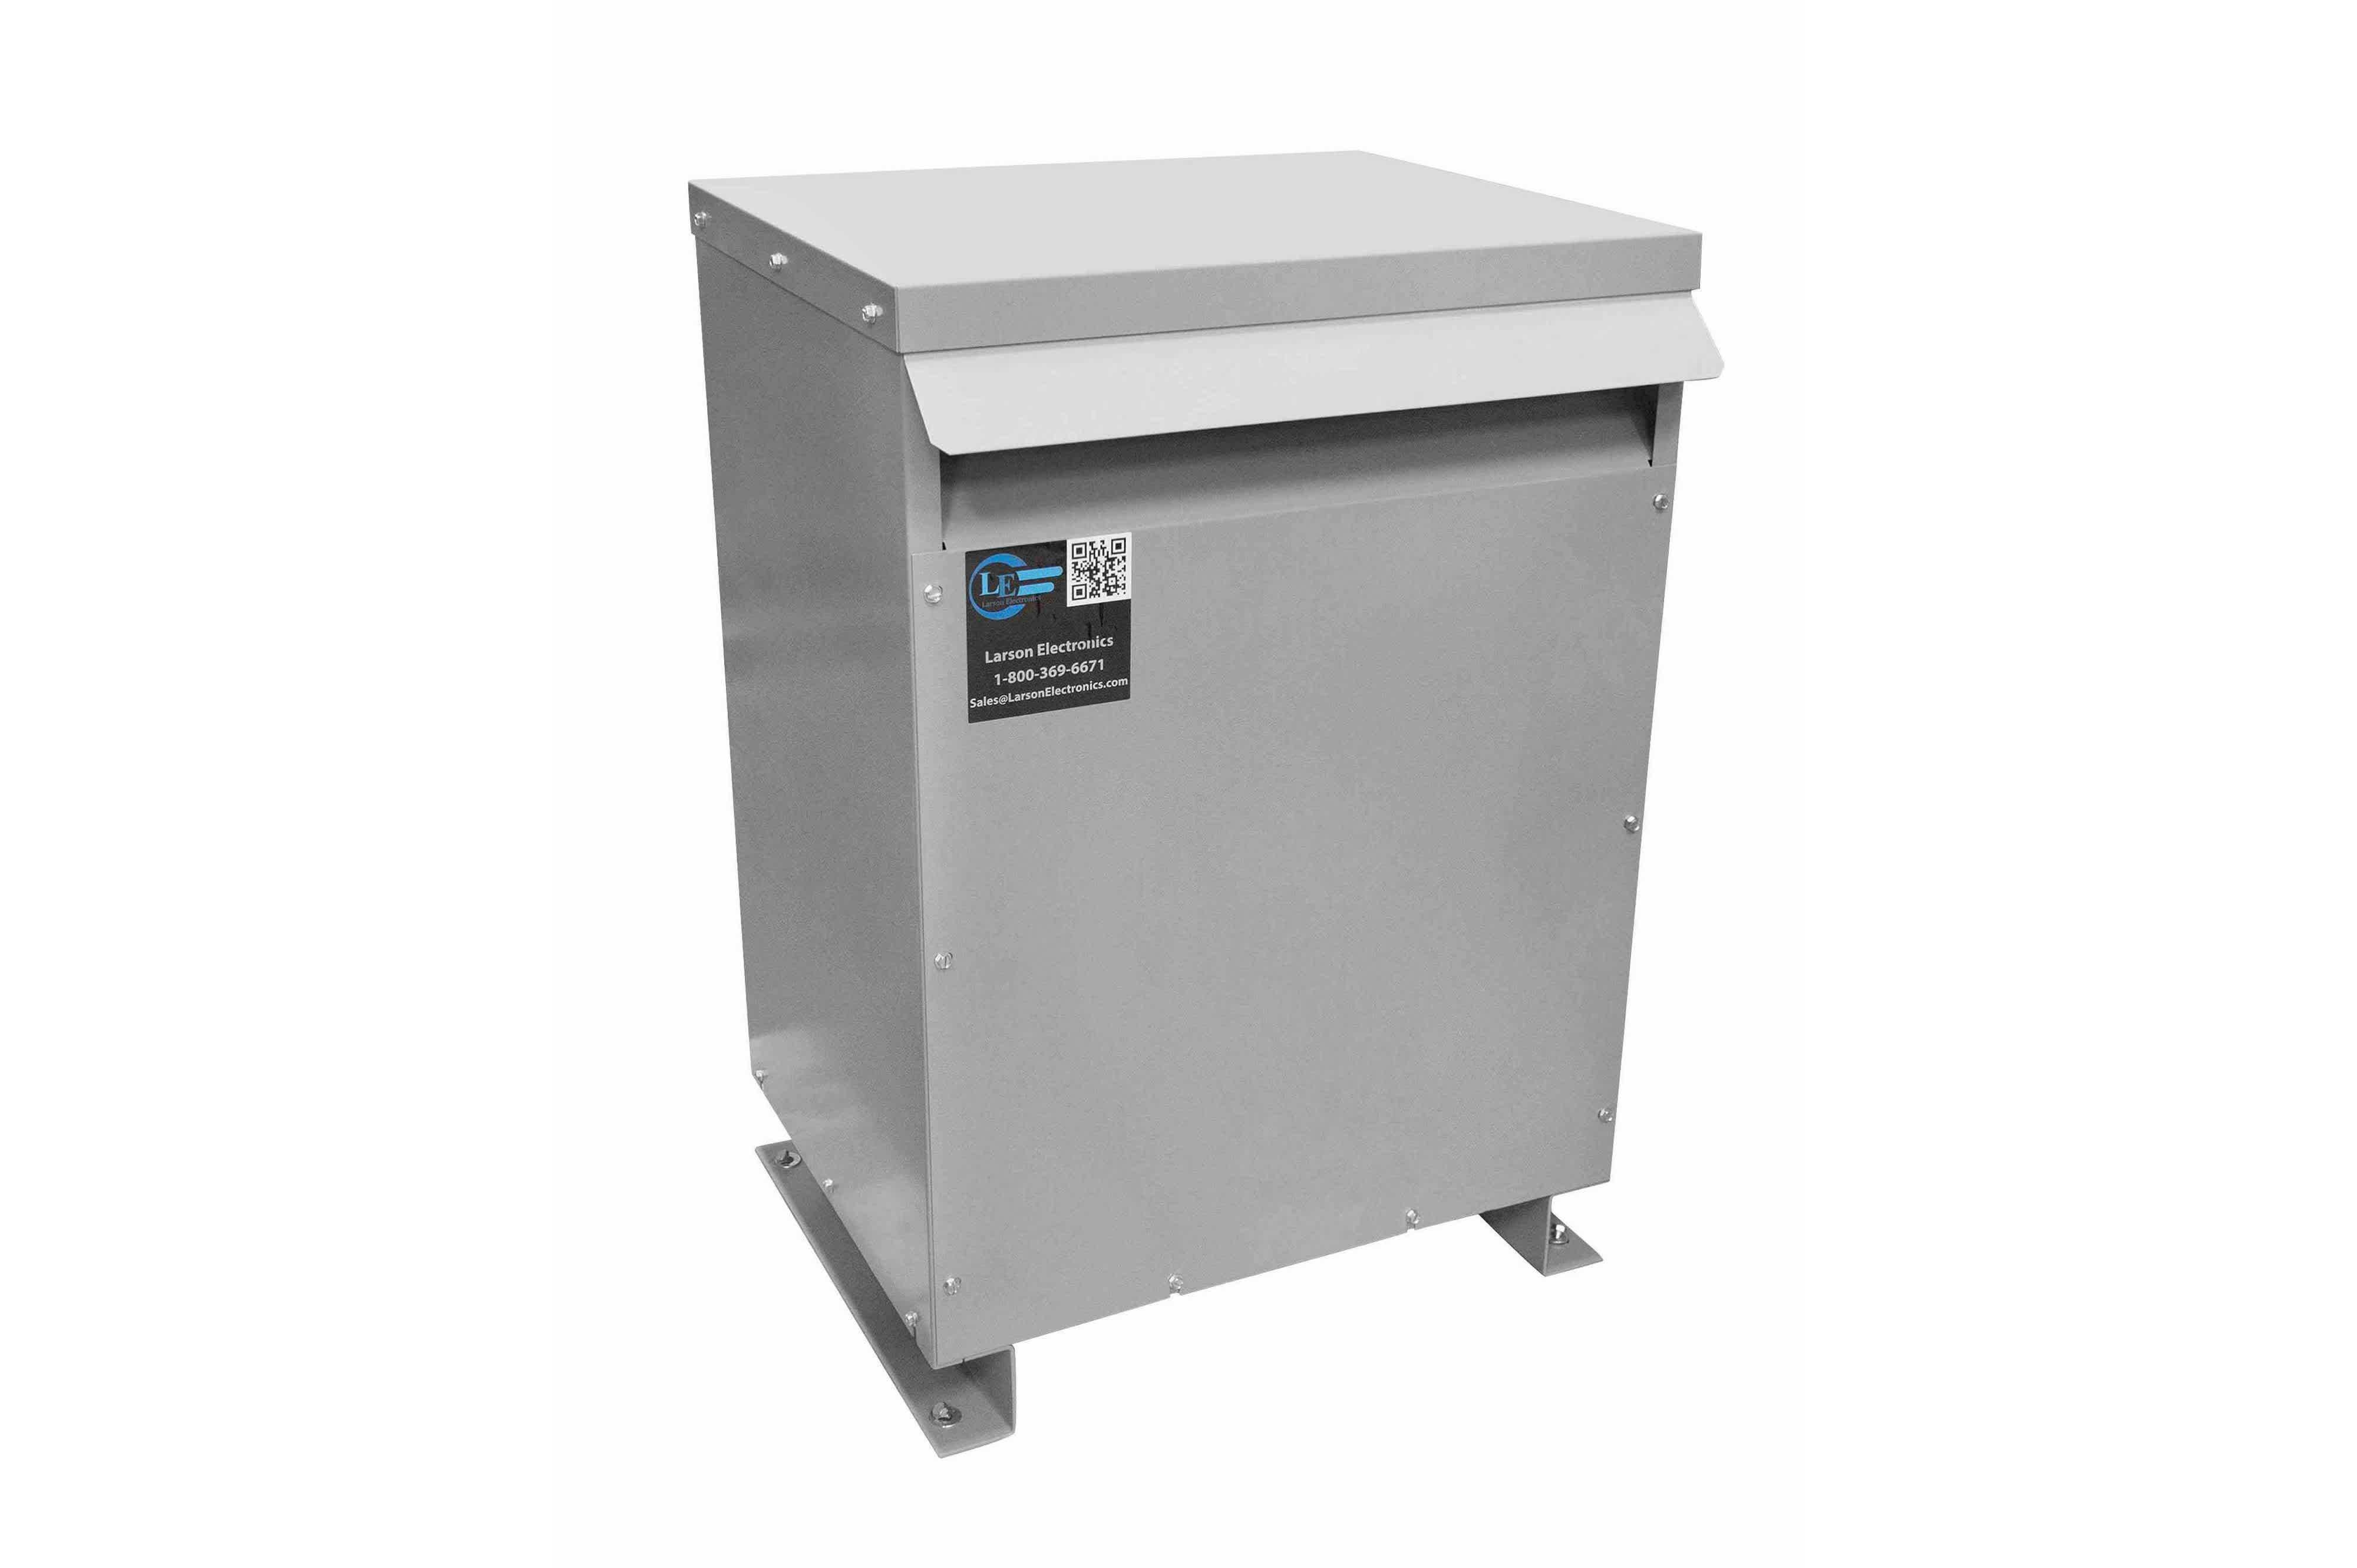 750 kVA 3PH Isolation Transformer, 600V Wye Primary, 240V/120 Delta Secondary, N3R, Ventilated, 60 Hz